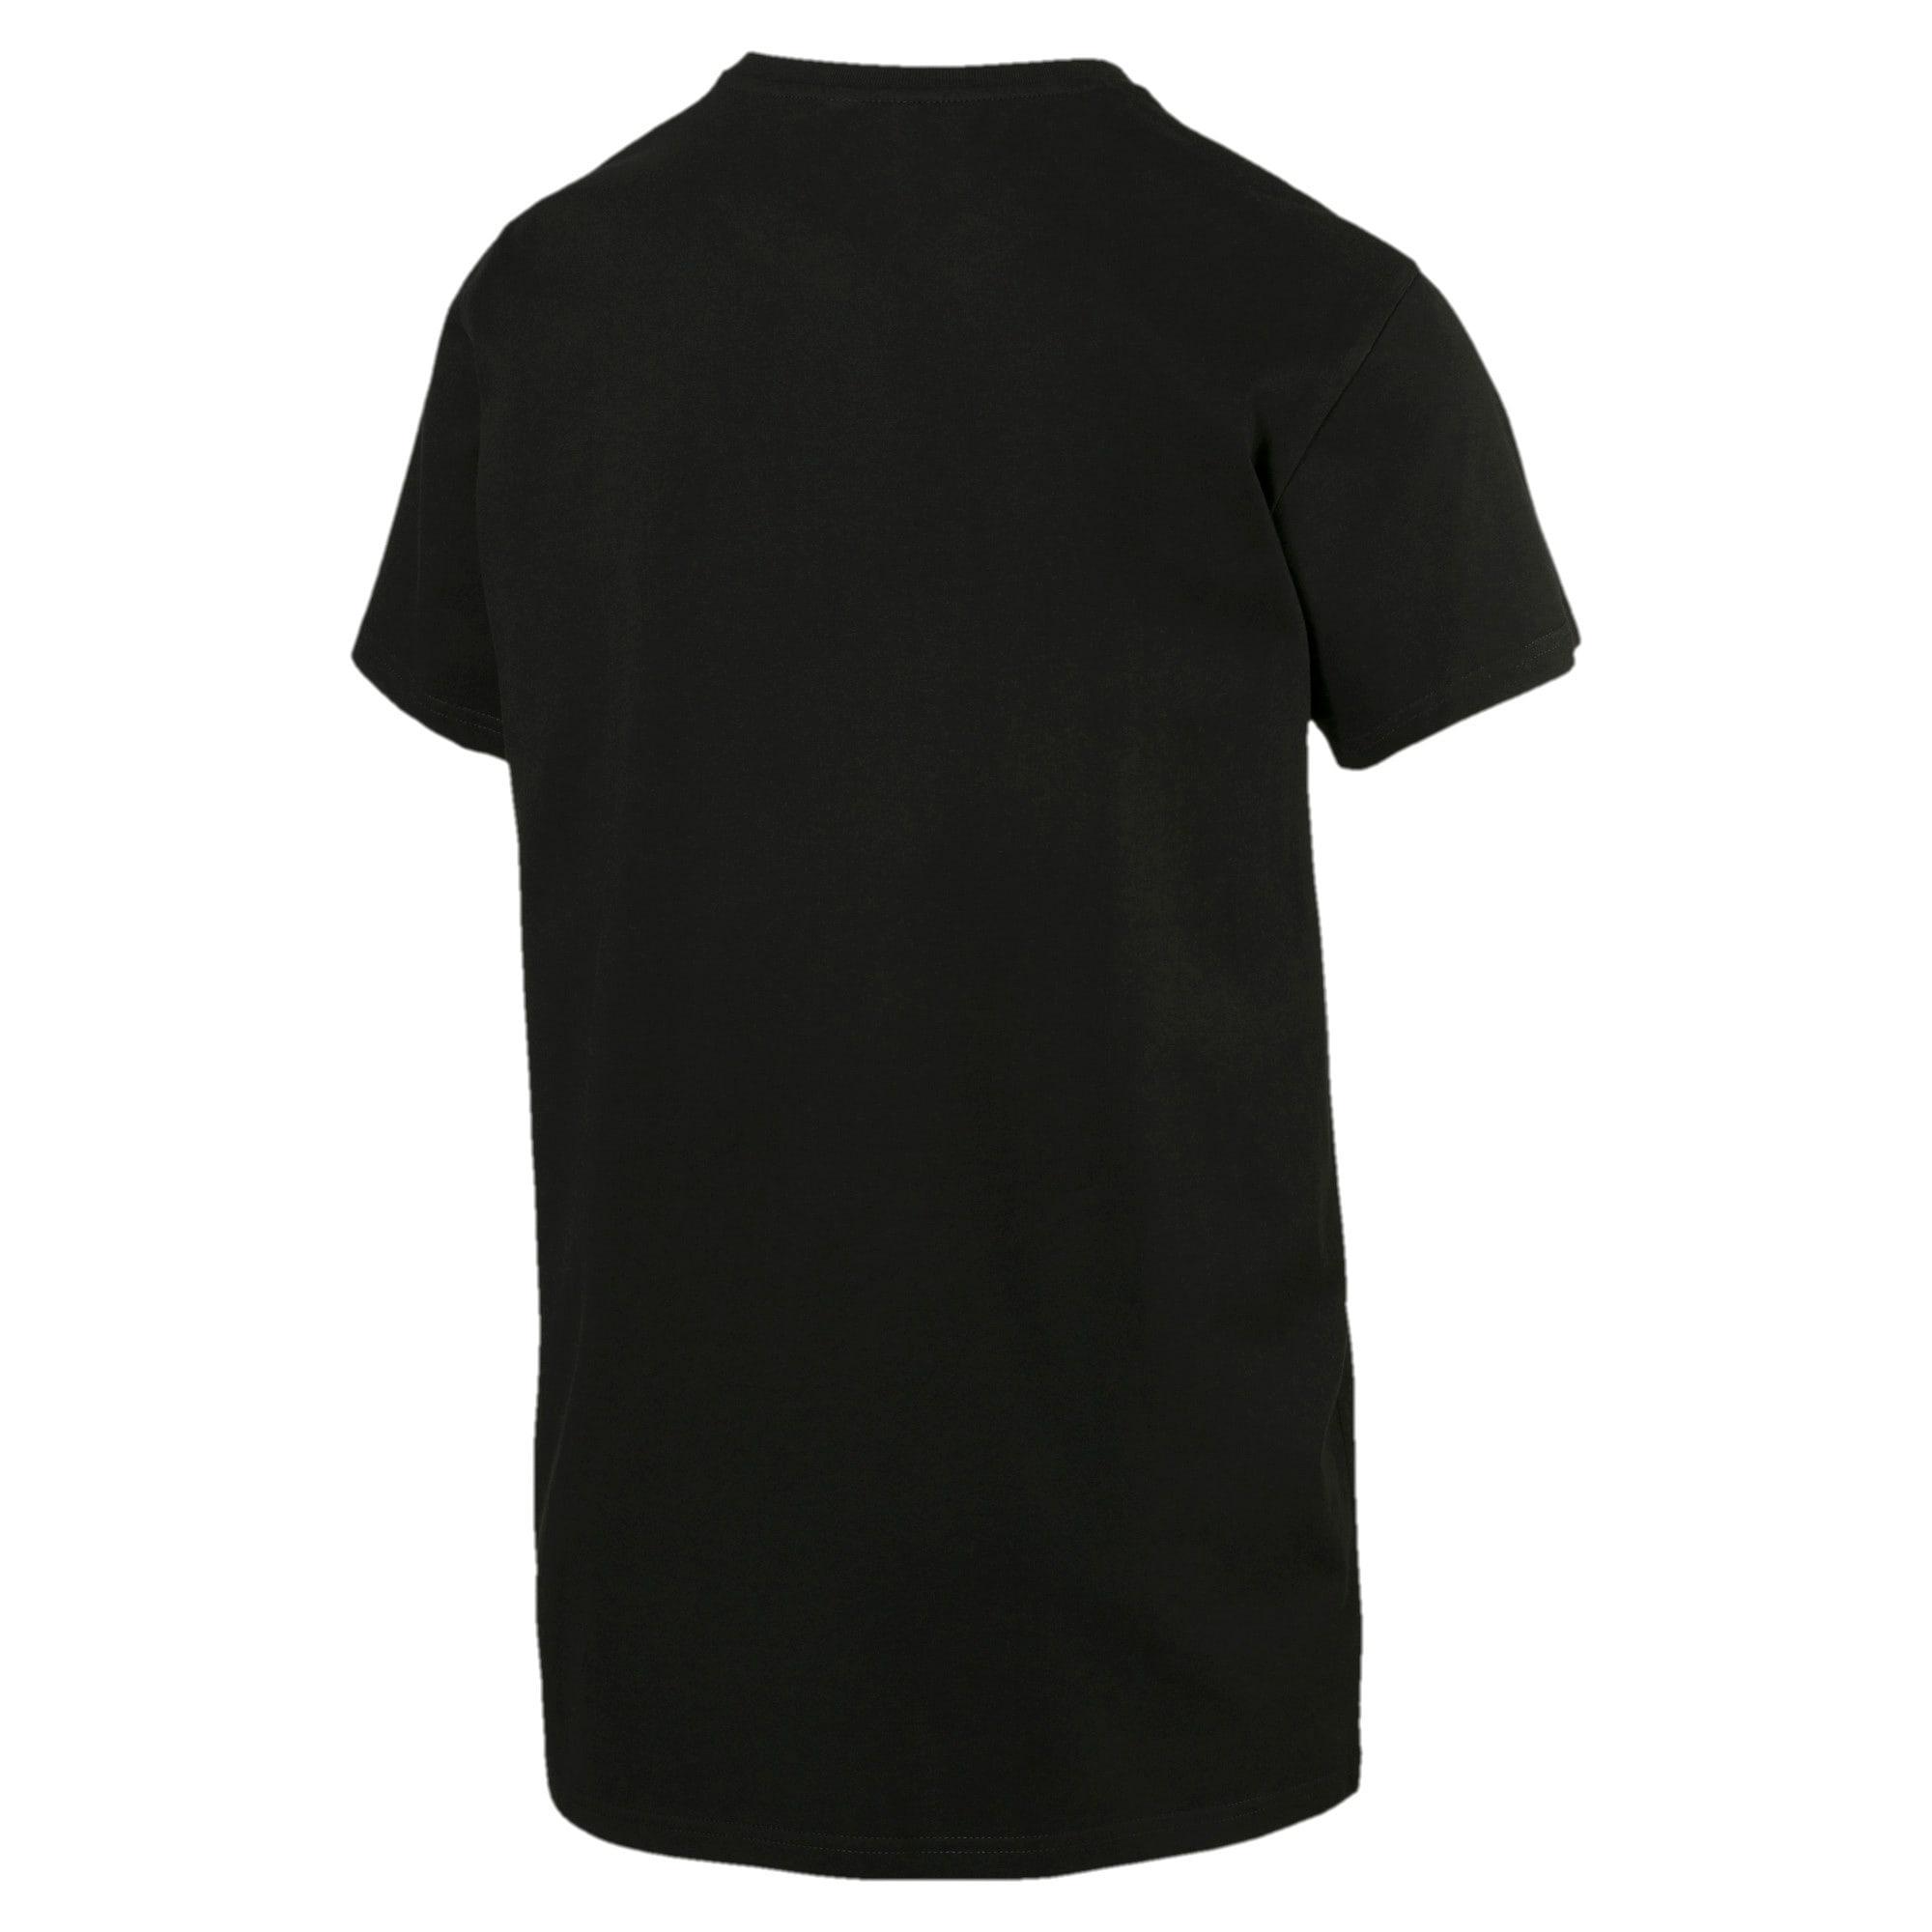 Miniatura 5 de Camiseta Classics con logo para hombre, Cotton Black, mediano